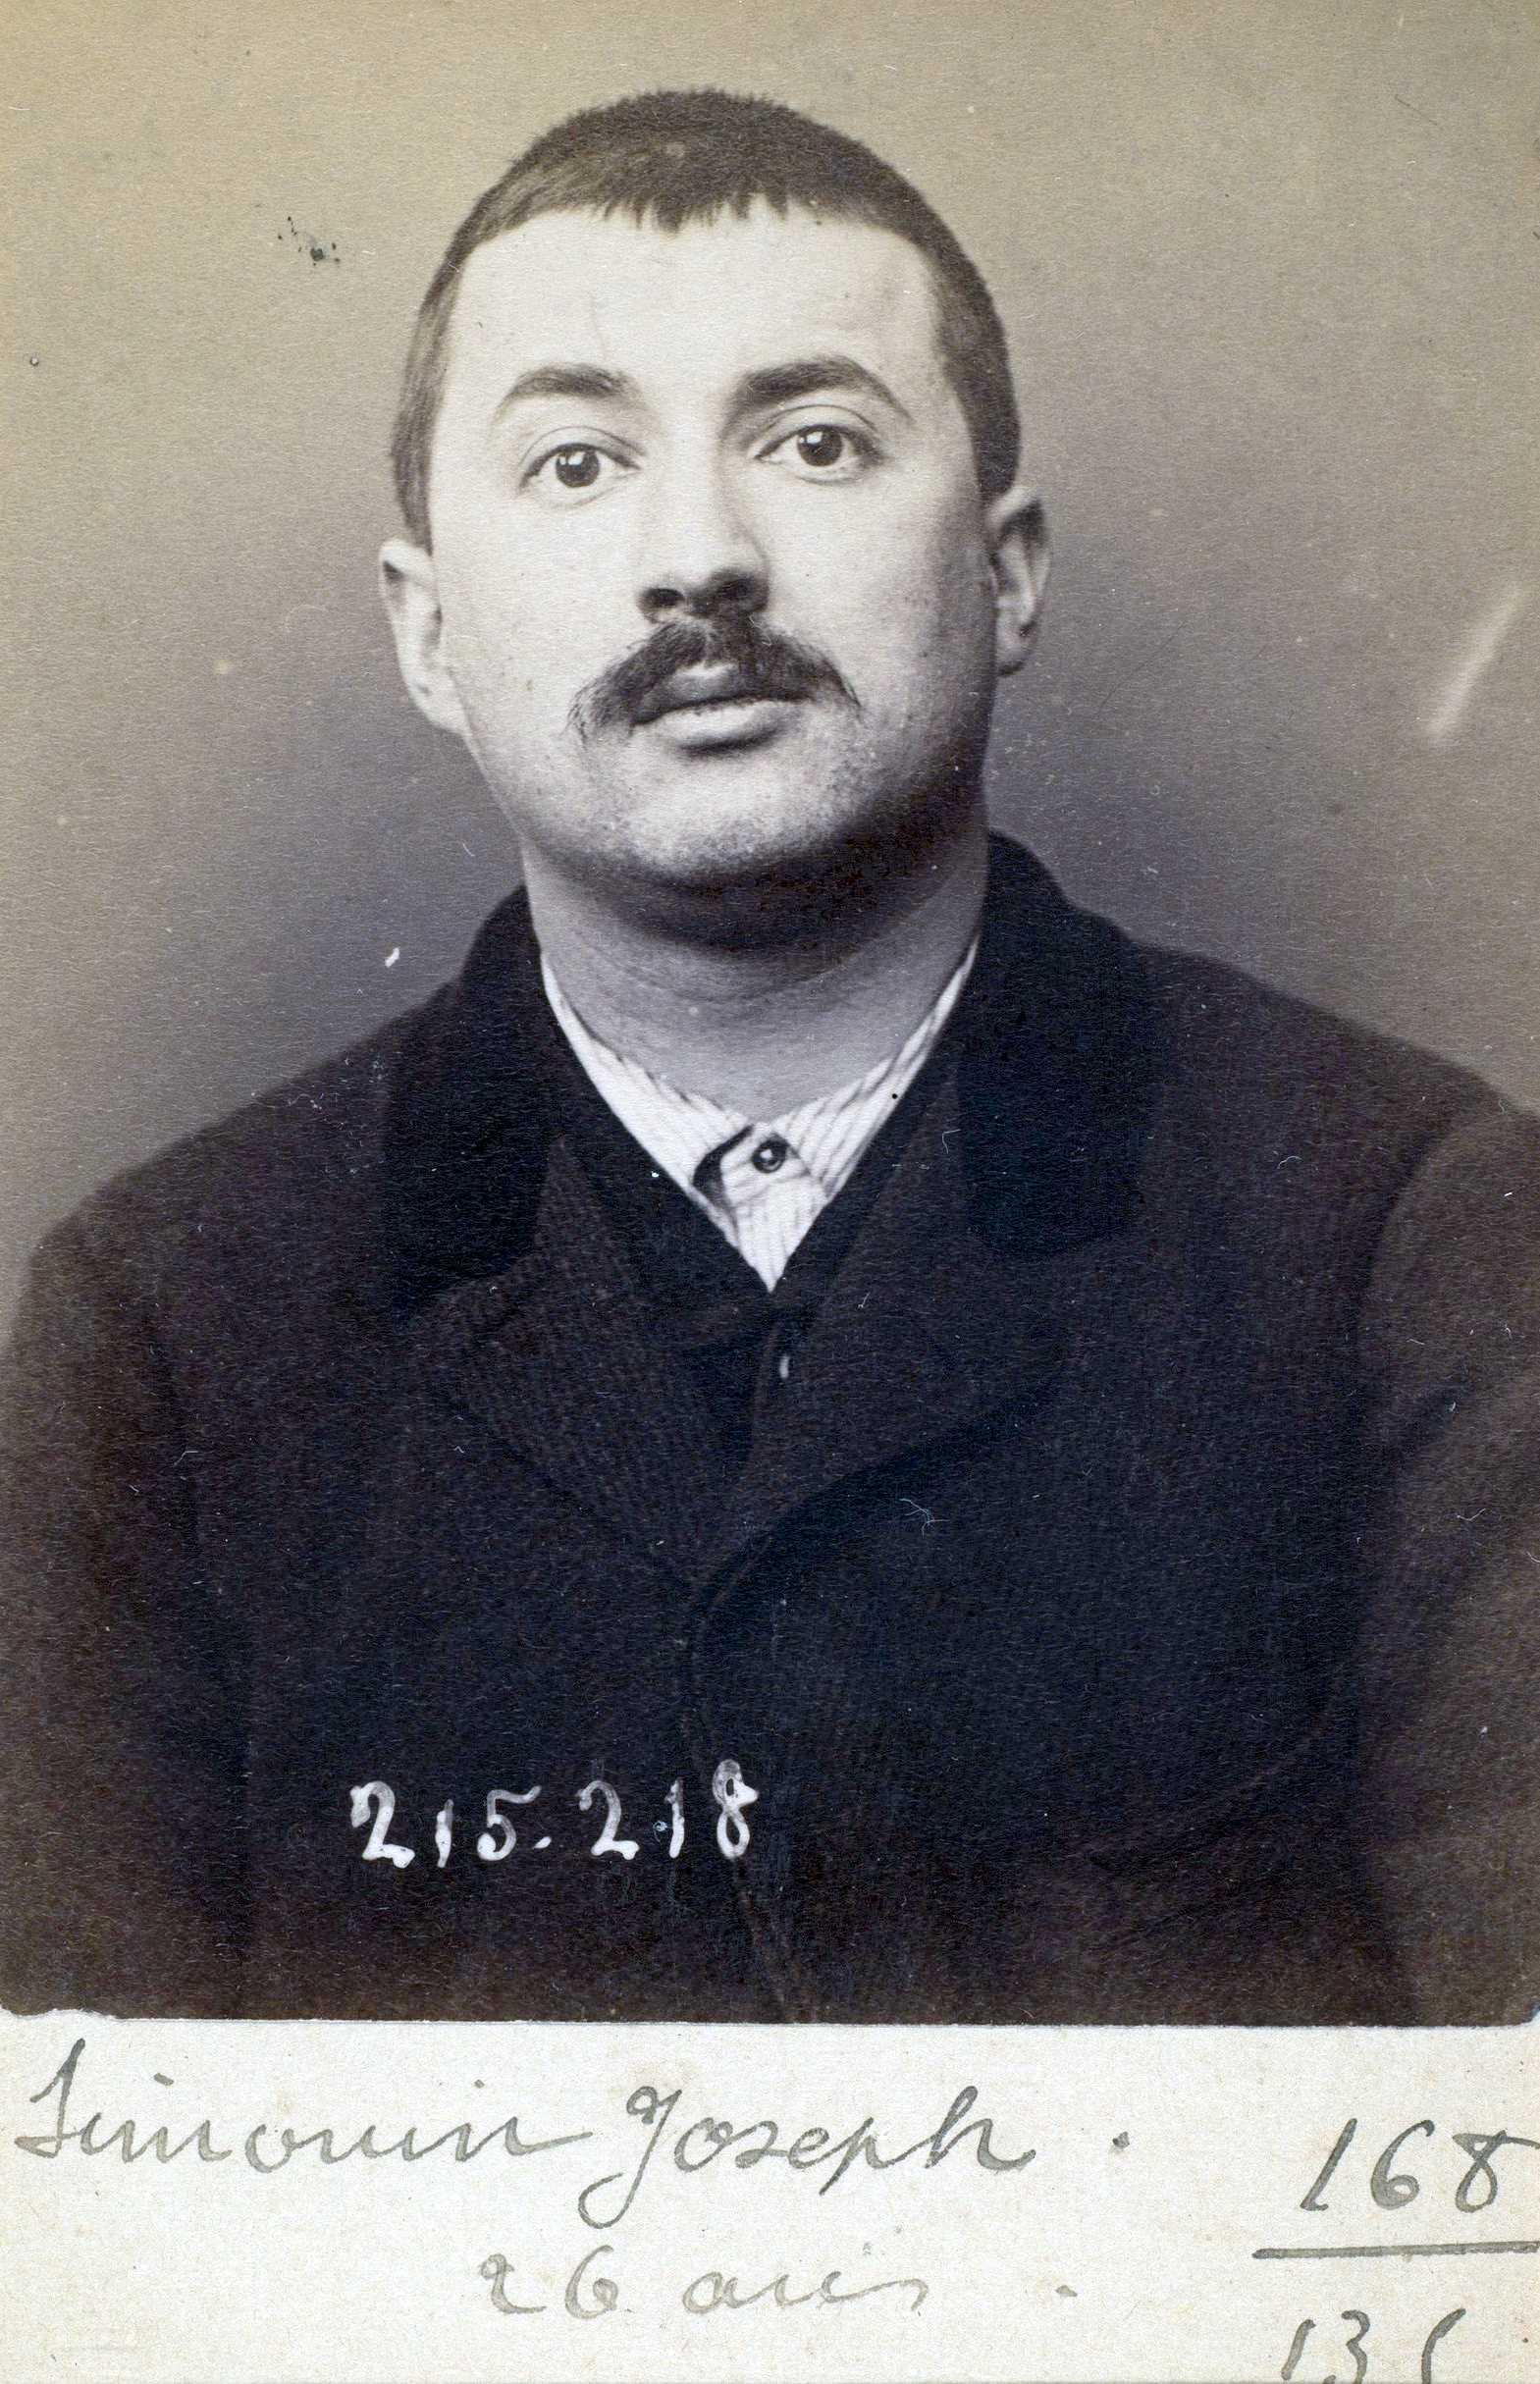 Foto policíaca de Joseph Simonin (6 de març de 1894)